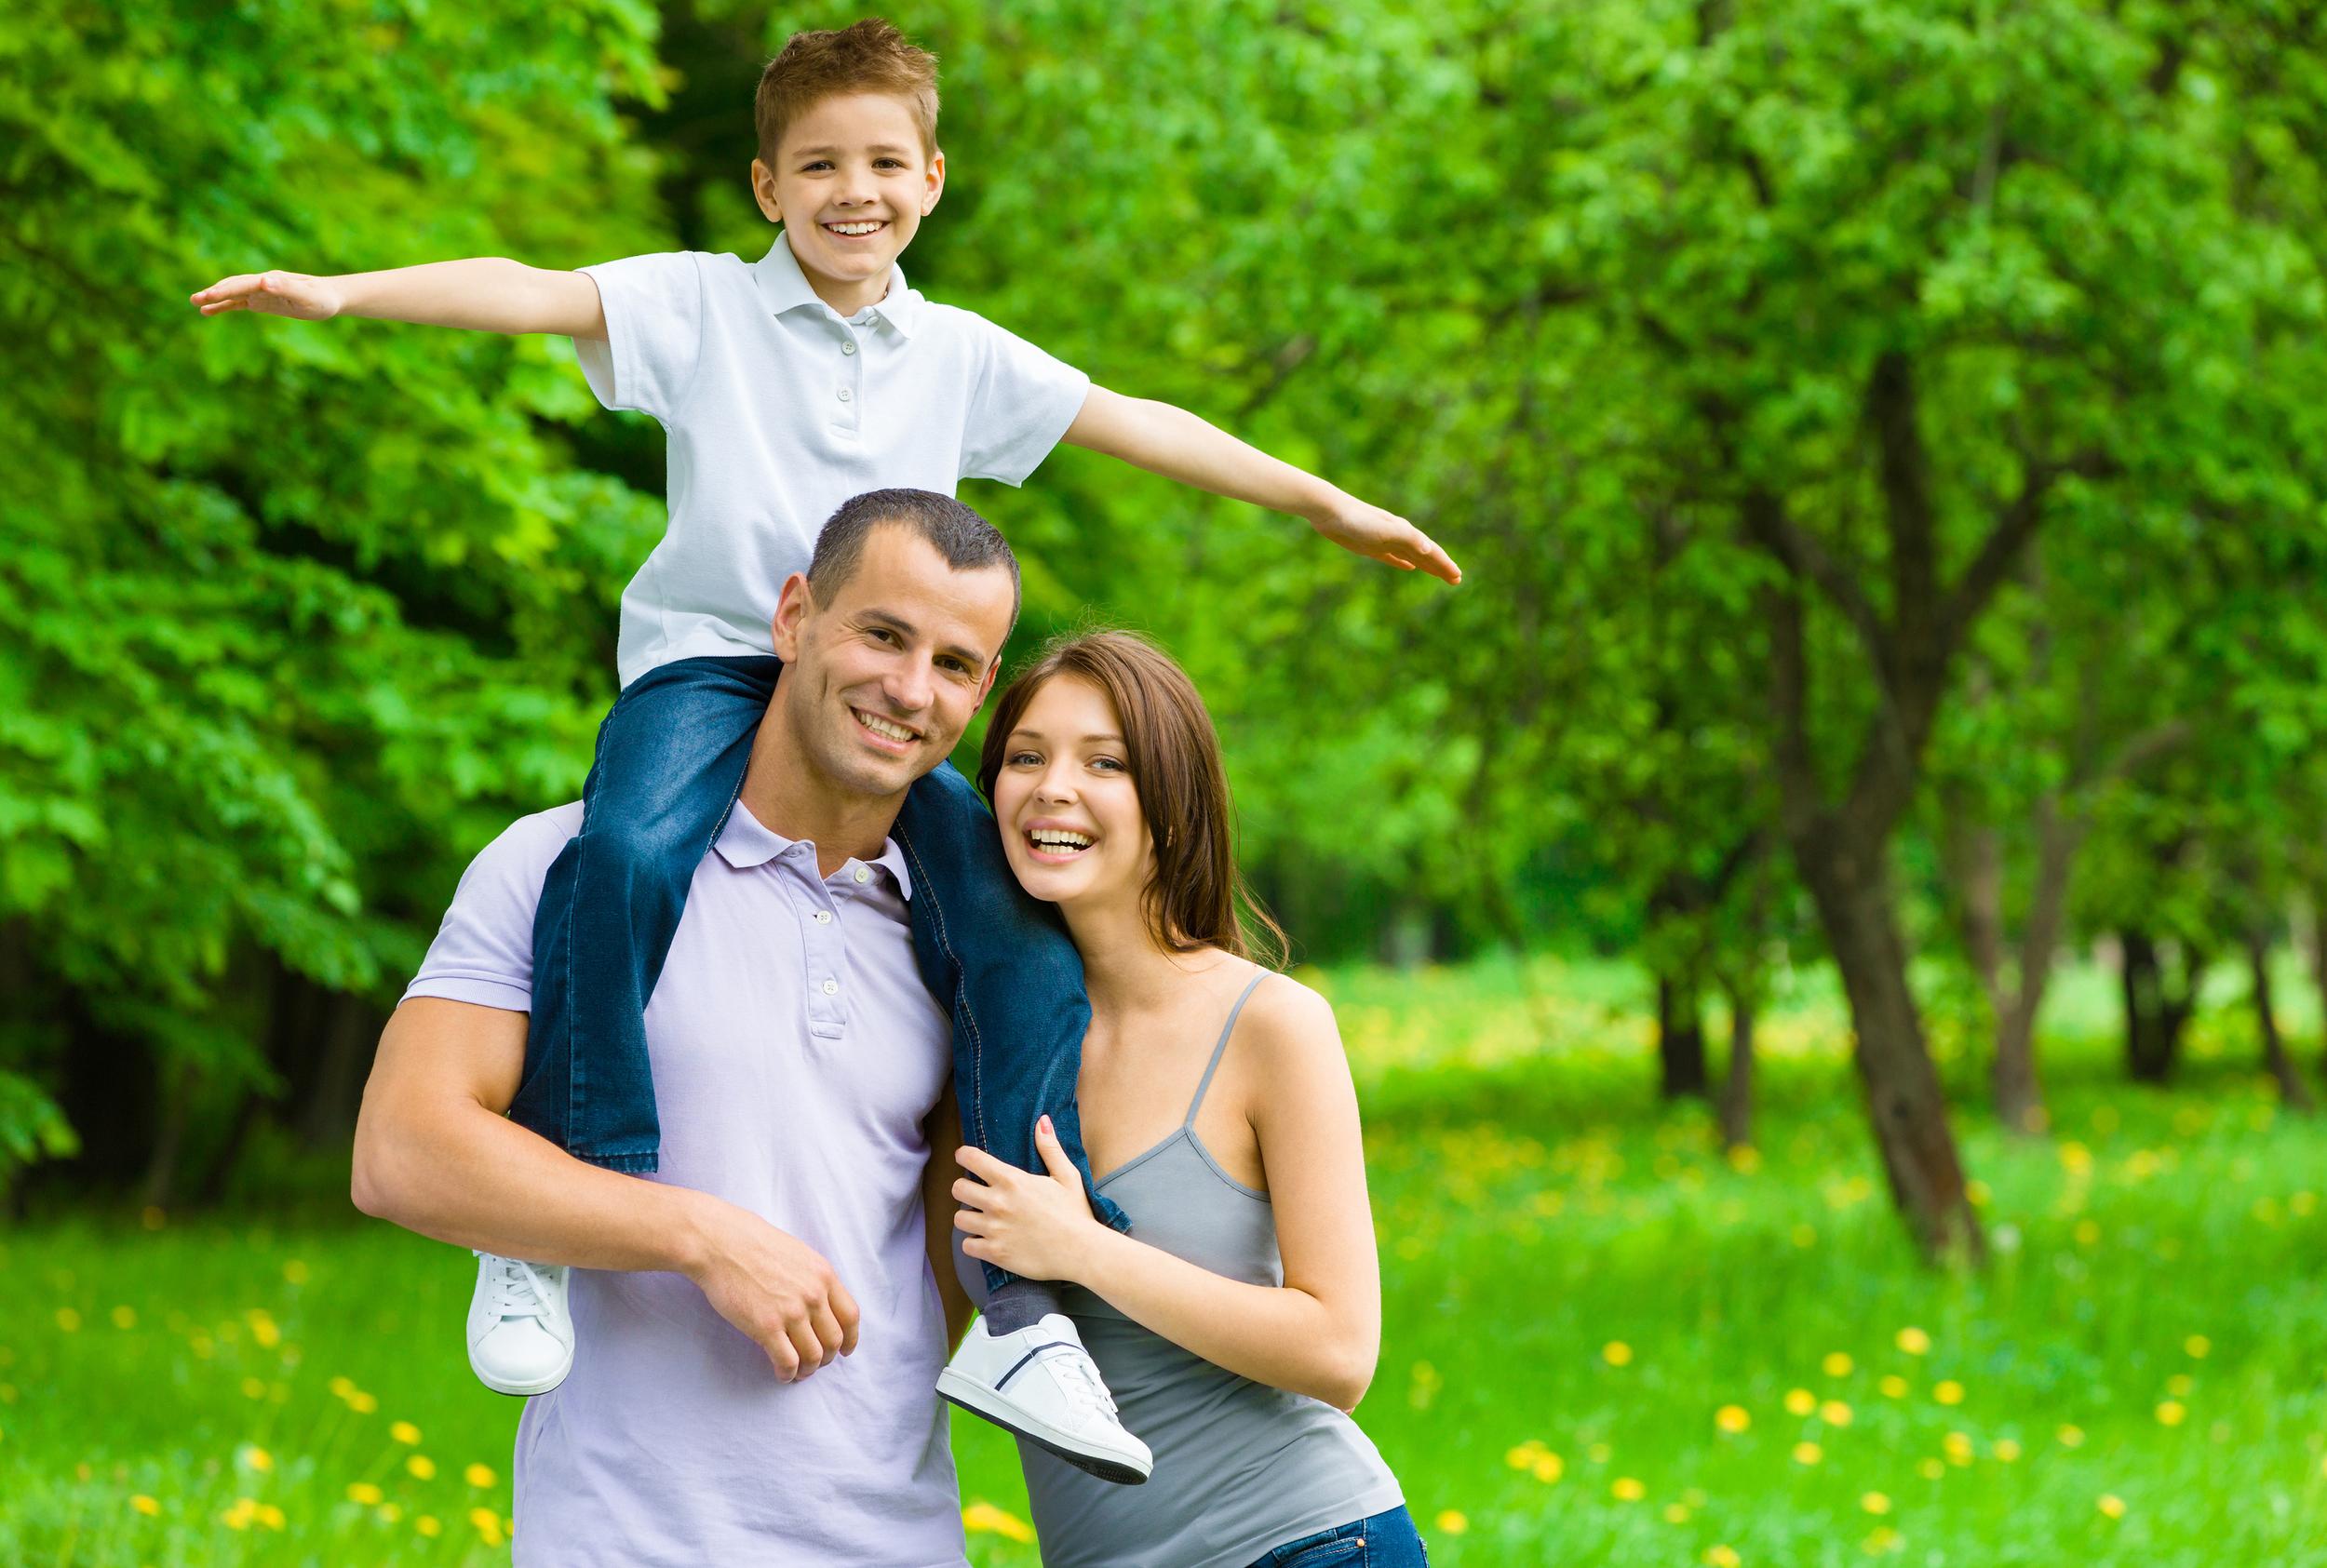 bigstock-Happy-family-of-three-Father--54199070.jpg